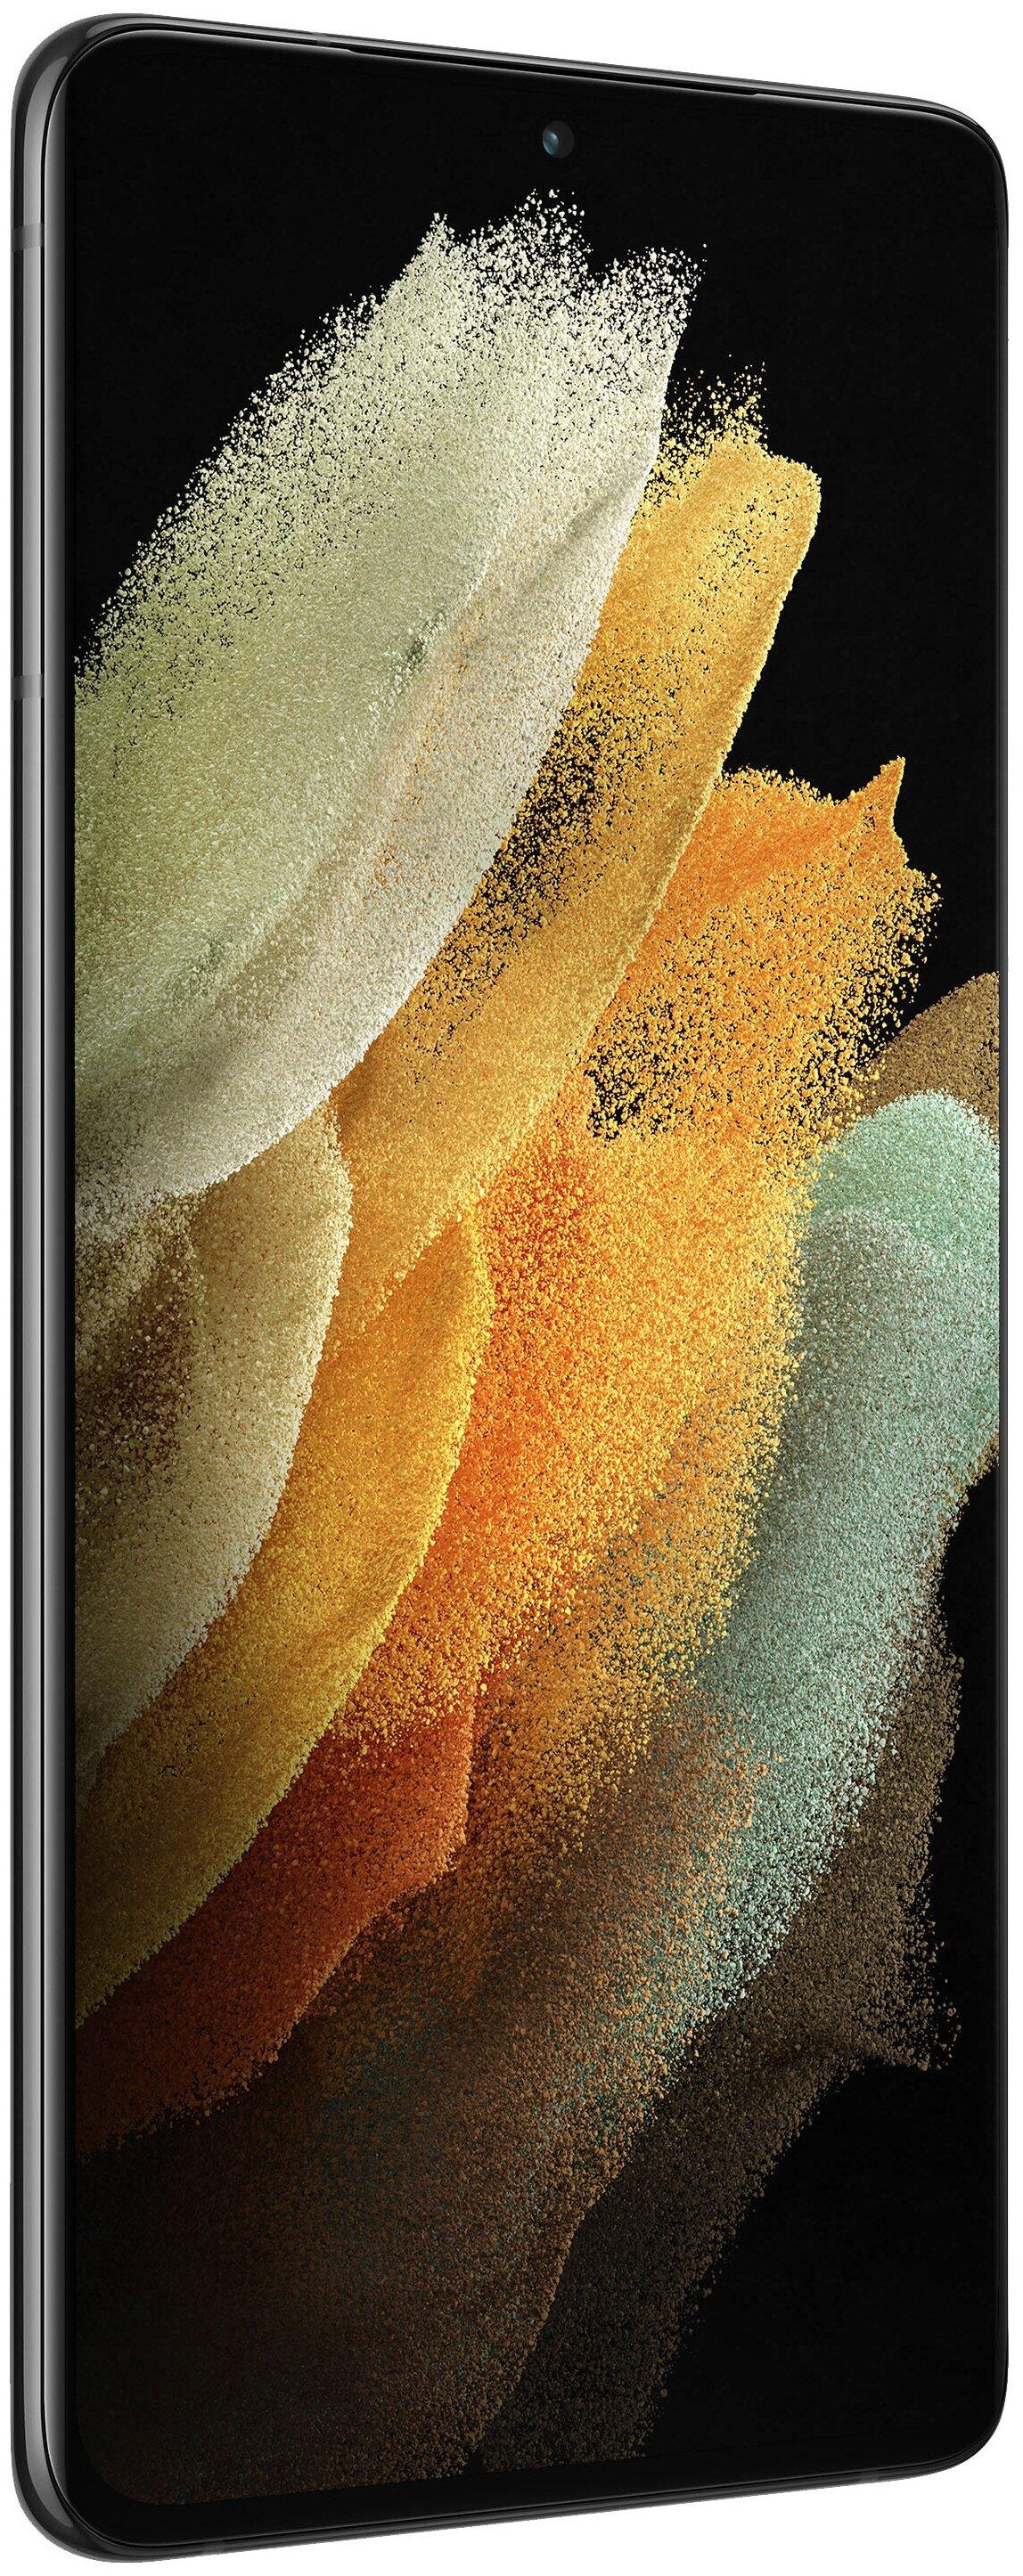 Samsung Galaxy S21 Ultra 5G 12/128GB - степень защиты: IP68